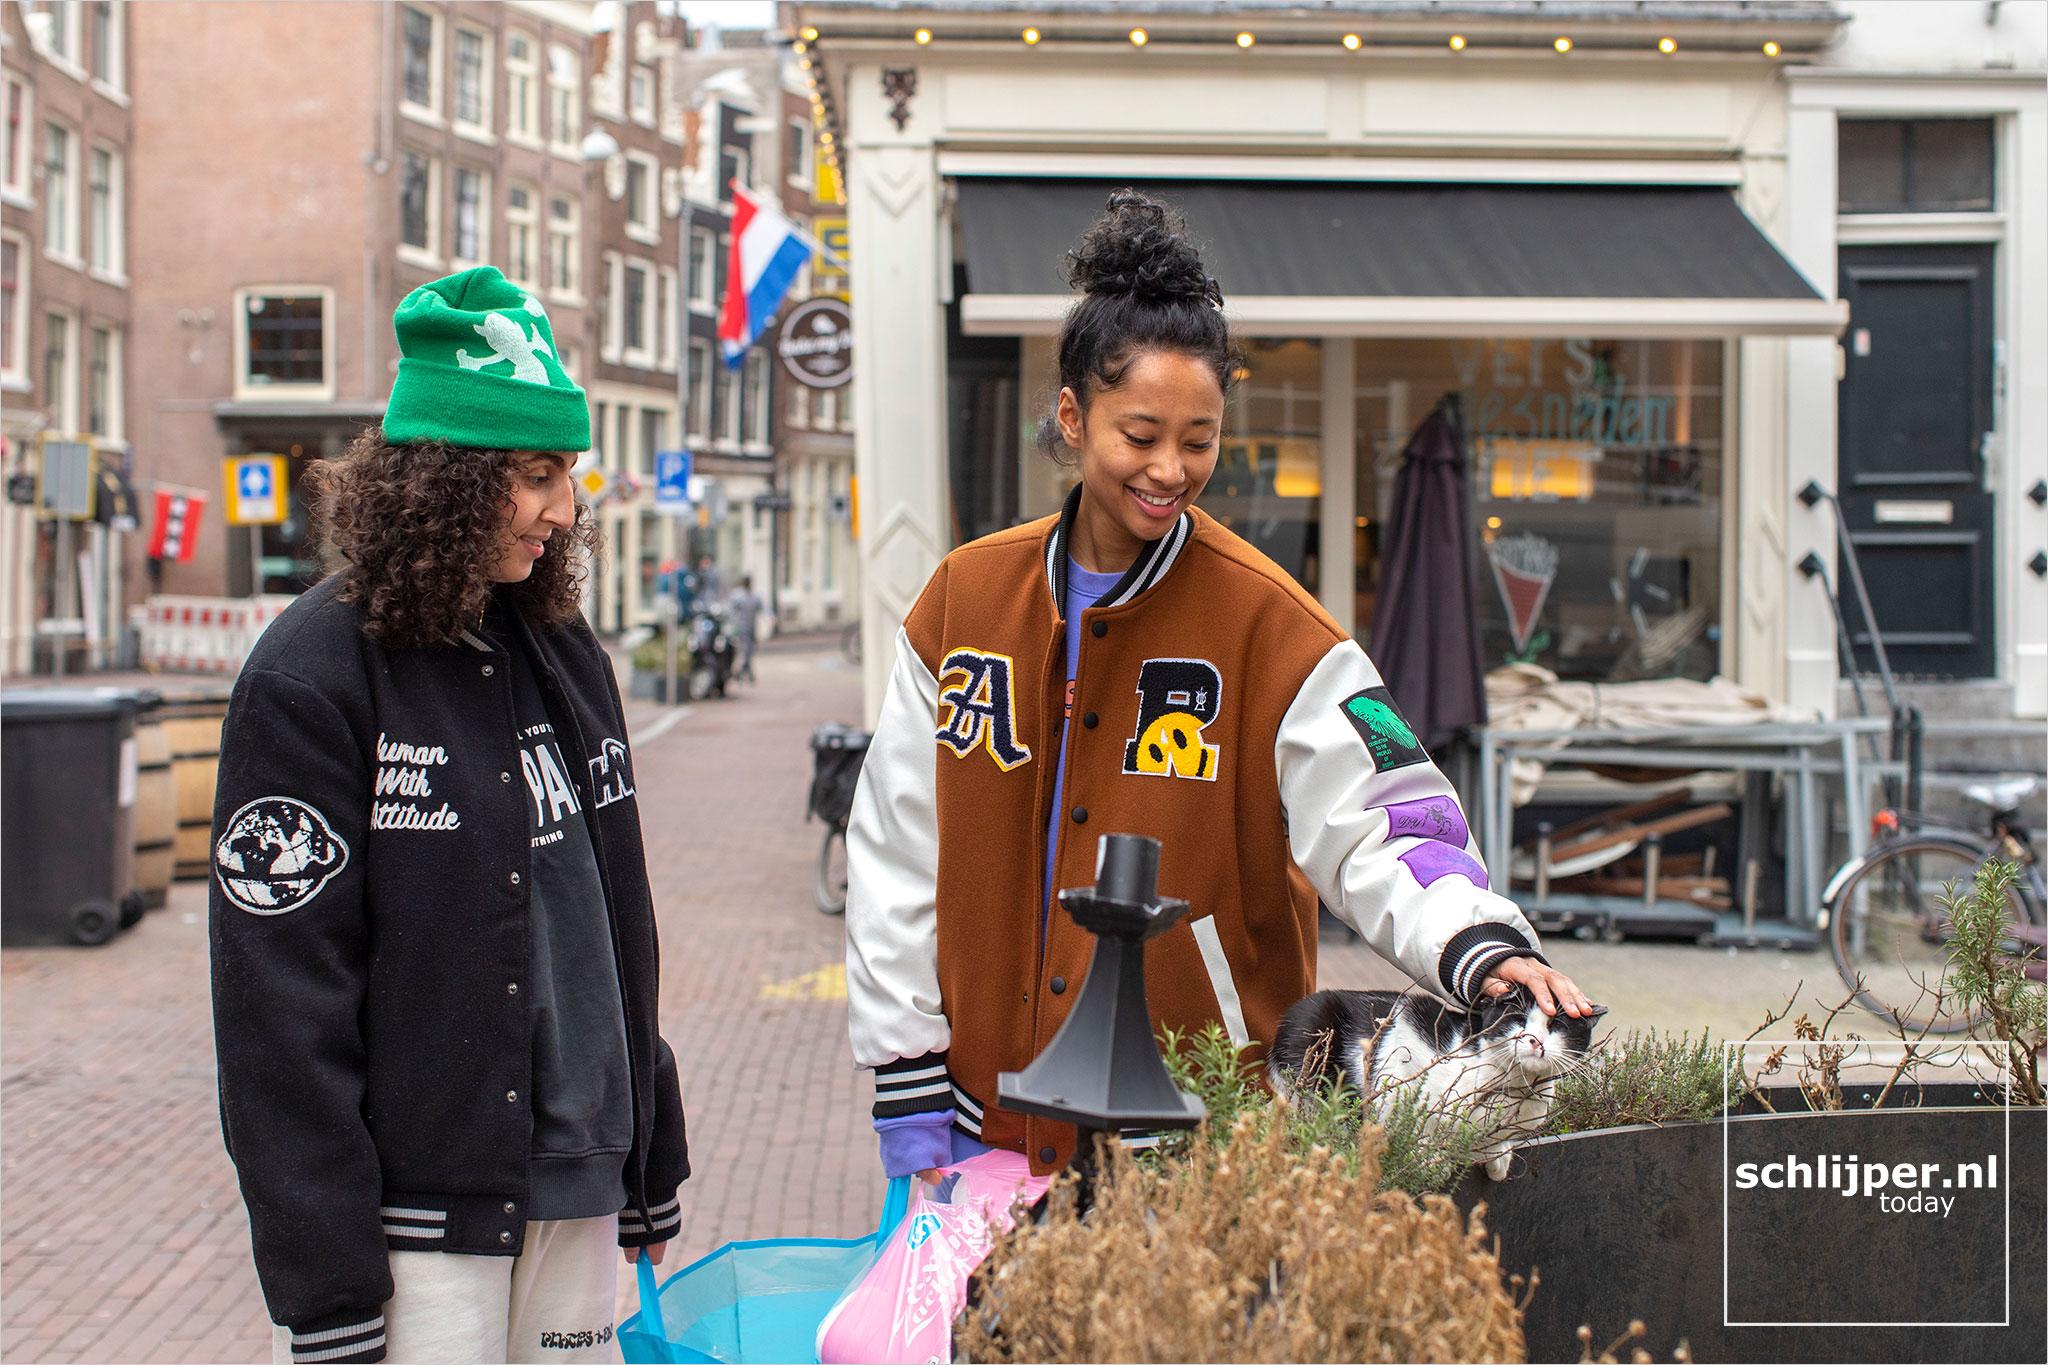 The Netherlands, Amsterdam, 22 maart 2021